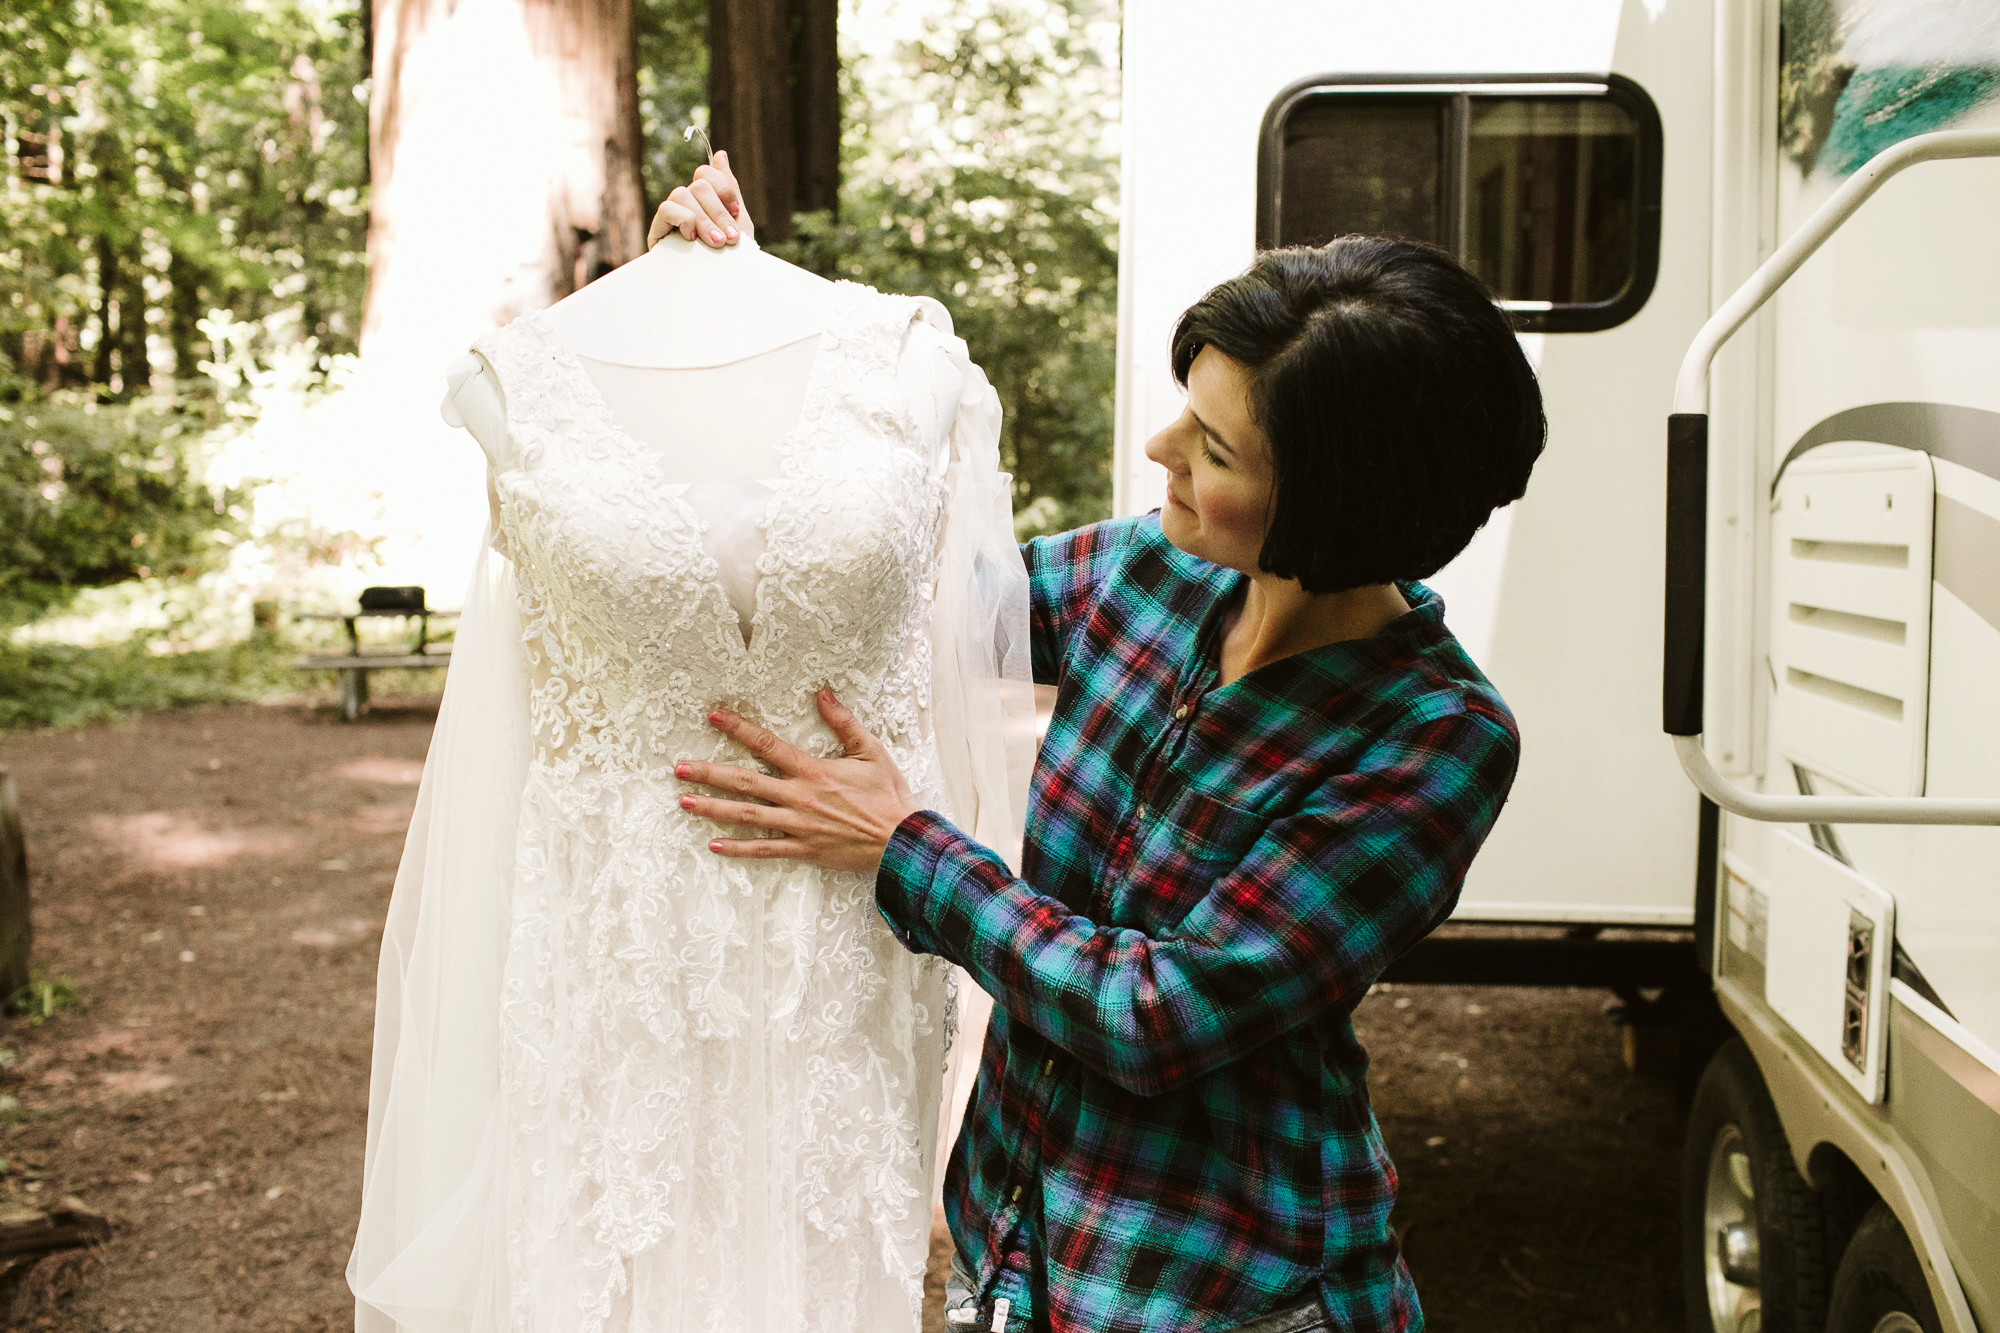 California-wedding-photographer-alfonso-flores-pamplin-groove-142.jpg